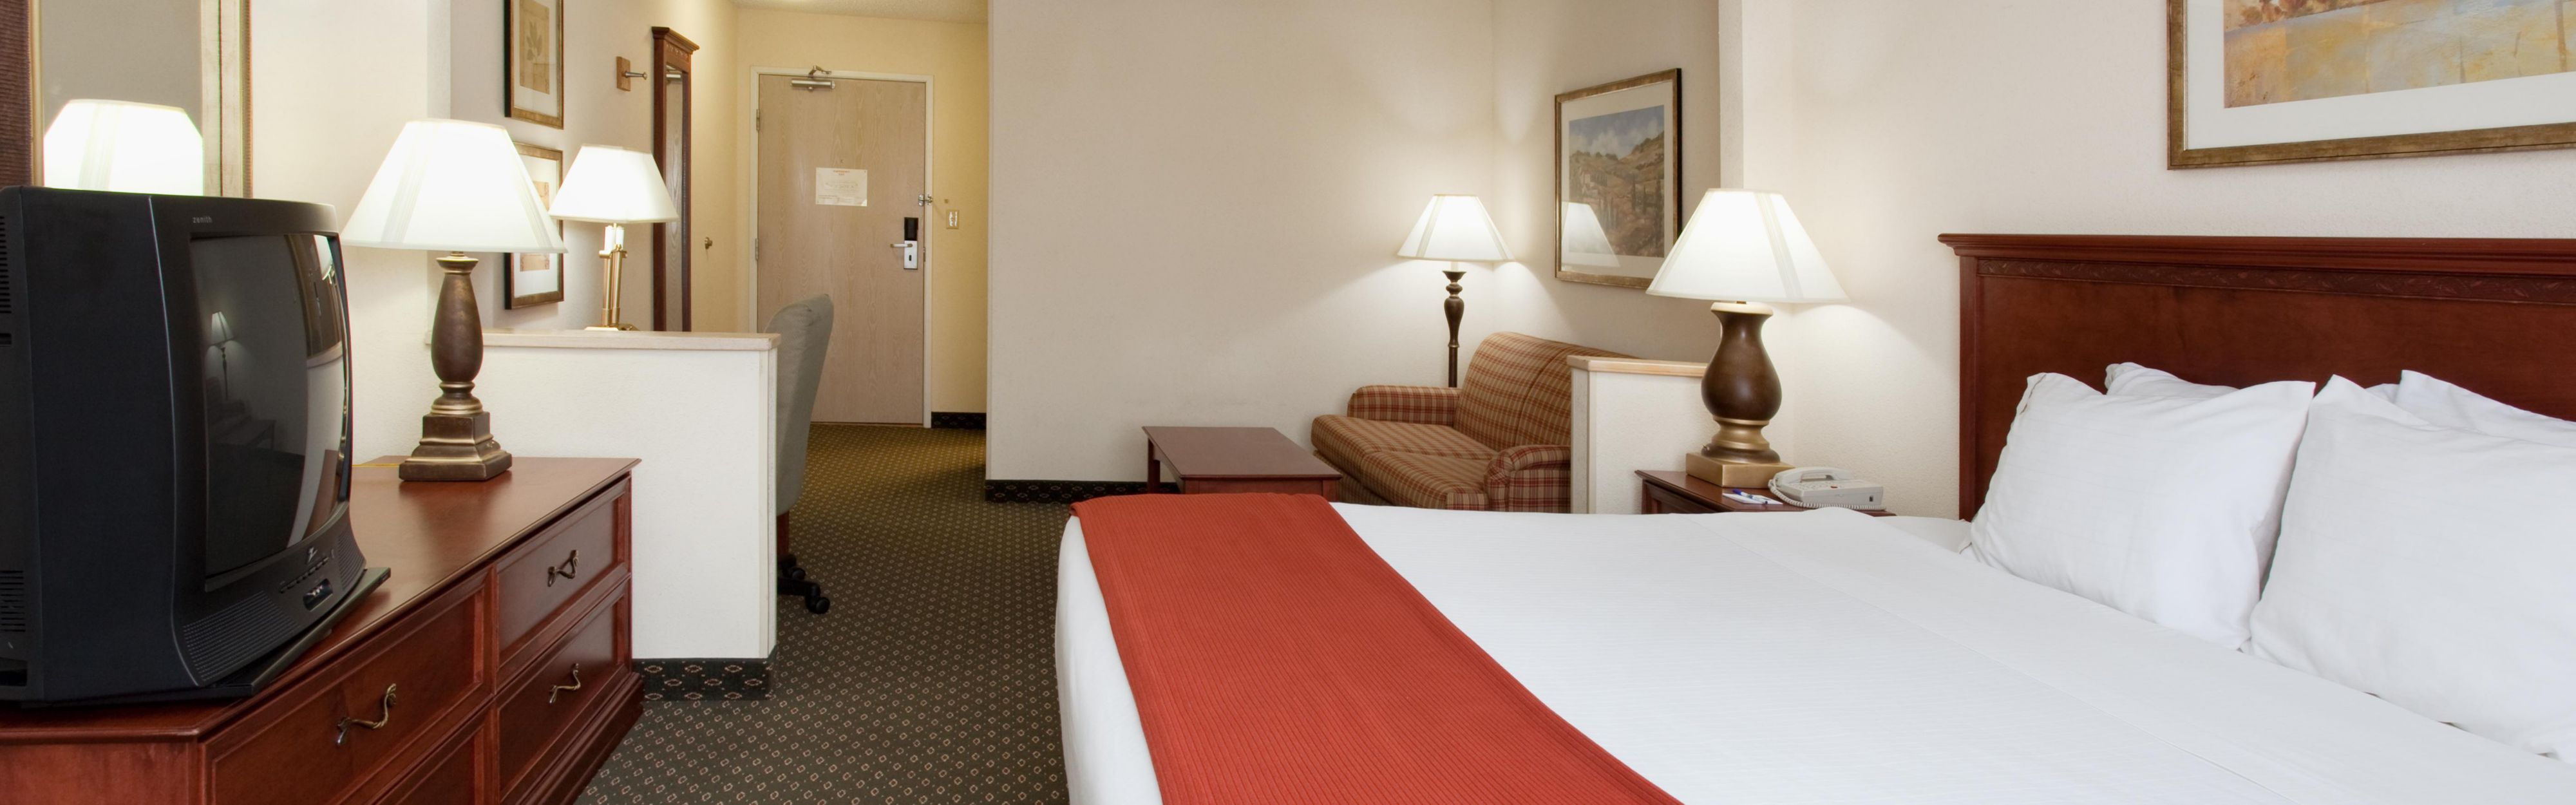 Holiday Inn Express Greeley image 1